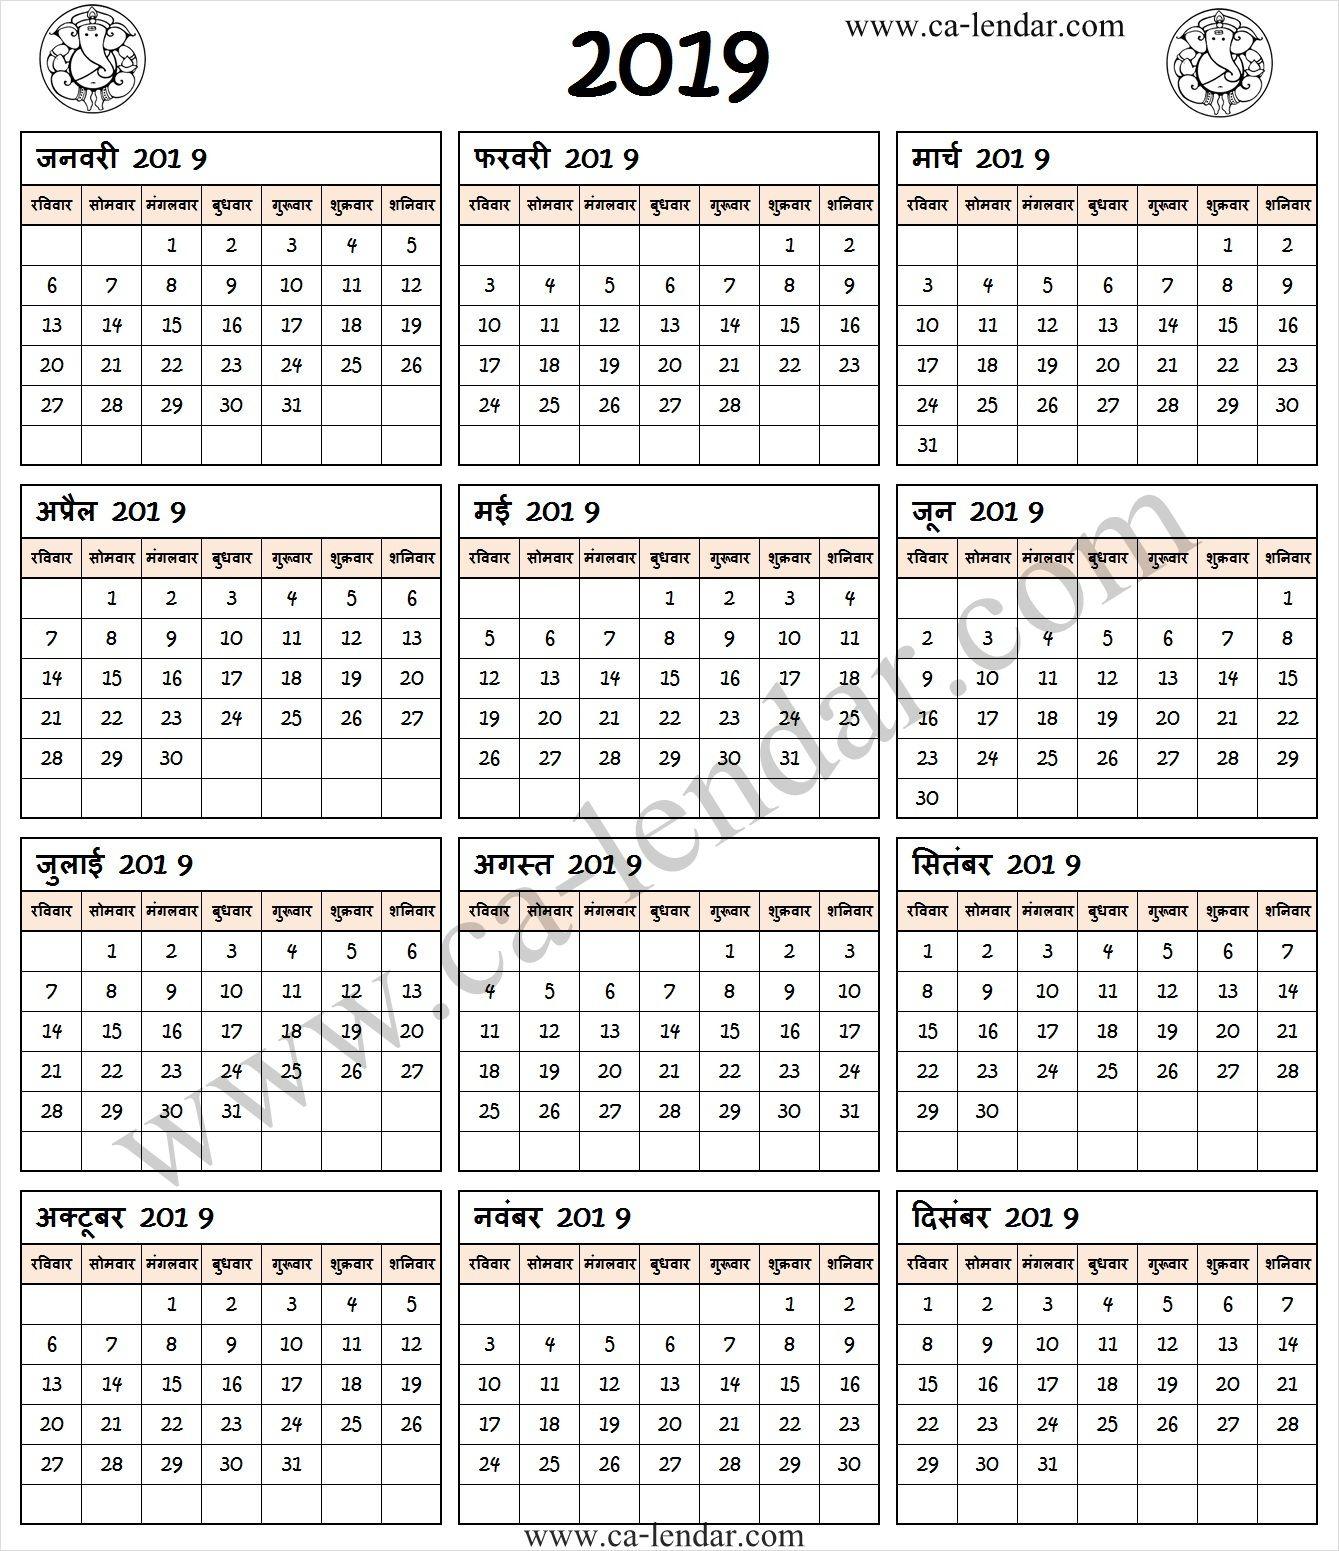 2019 Hindu Calendar Editable 2019 Calendar Pinterest Calendar